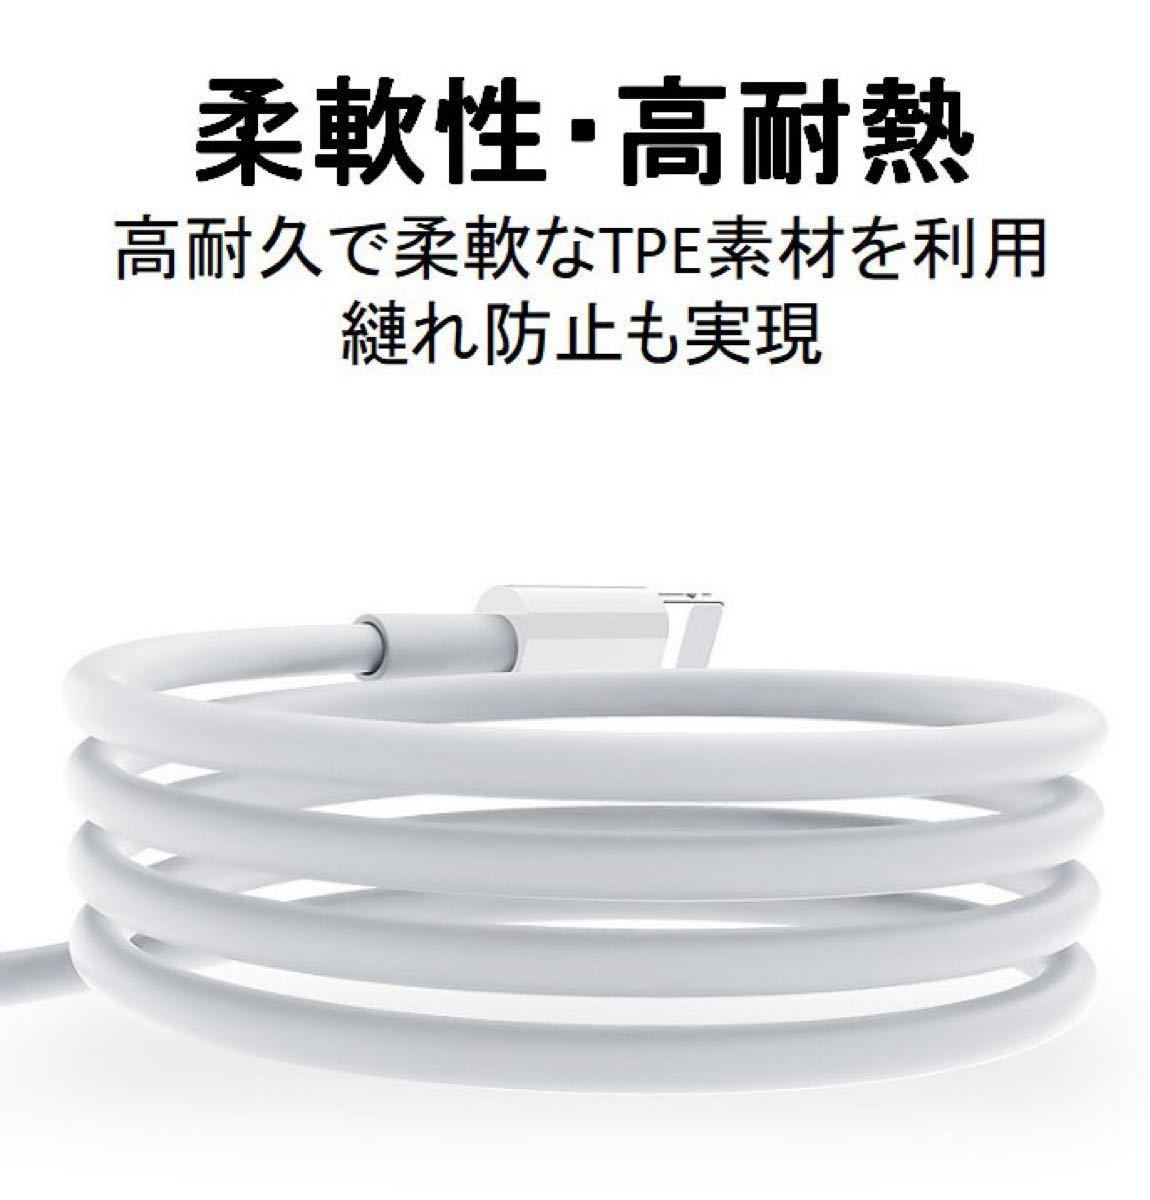 iPhone ライトニングケーブル 充電 1m 5本+1本セット 送料無料 USBケーブル 急速充電 保証 安い データ通信